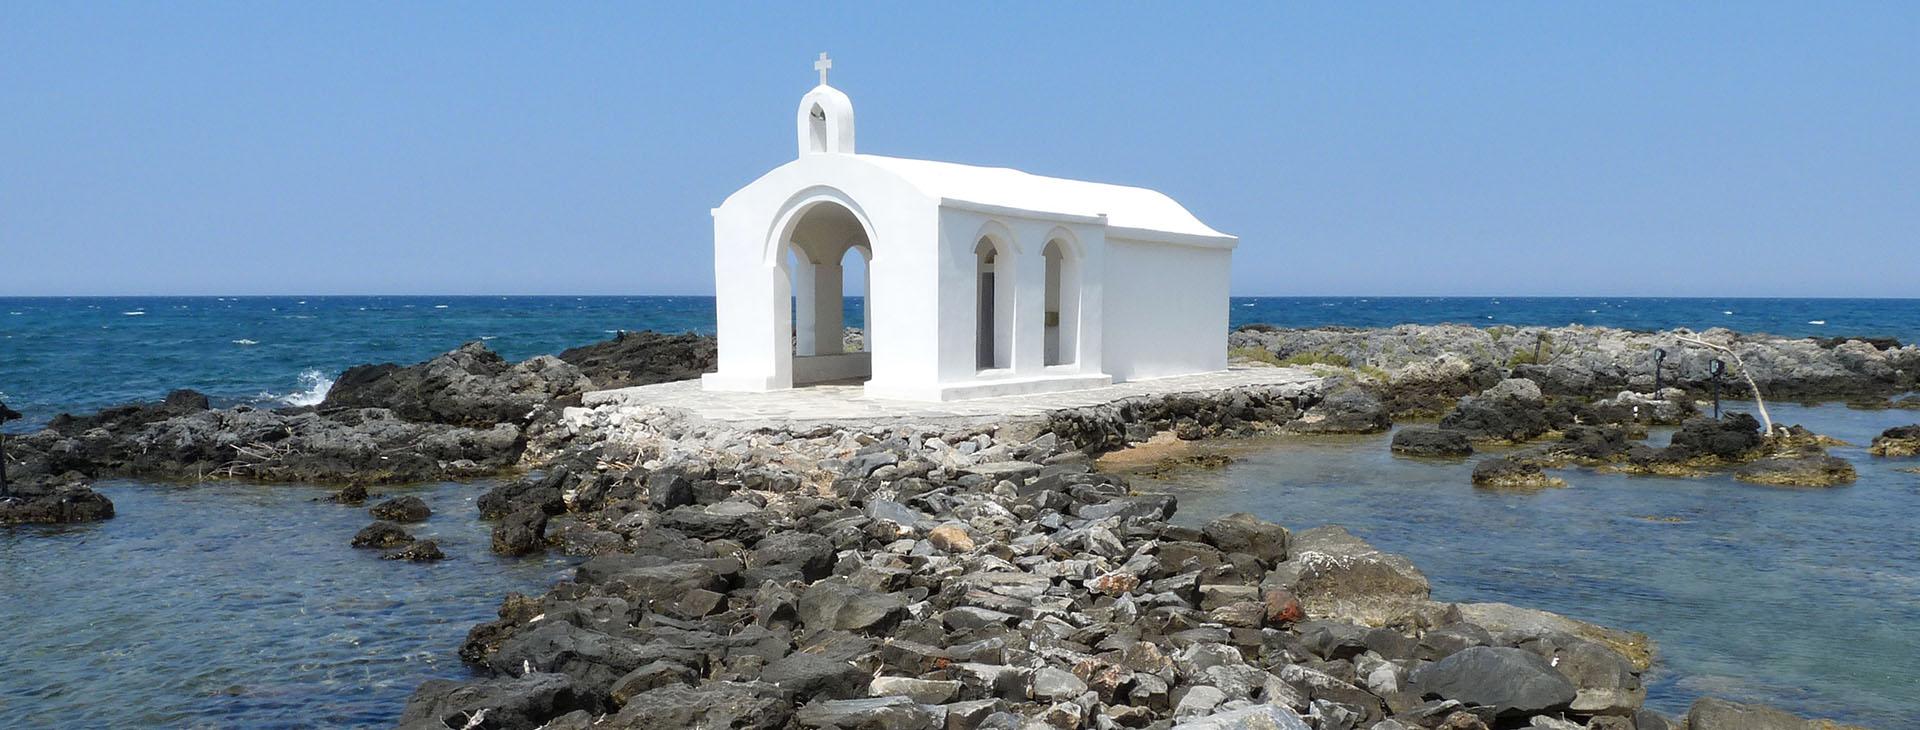 St. Nicolas Chapel, Georgioupolis, Chania